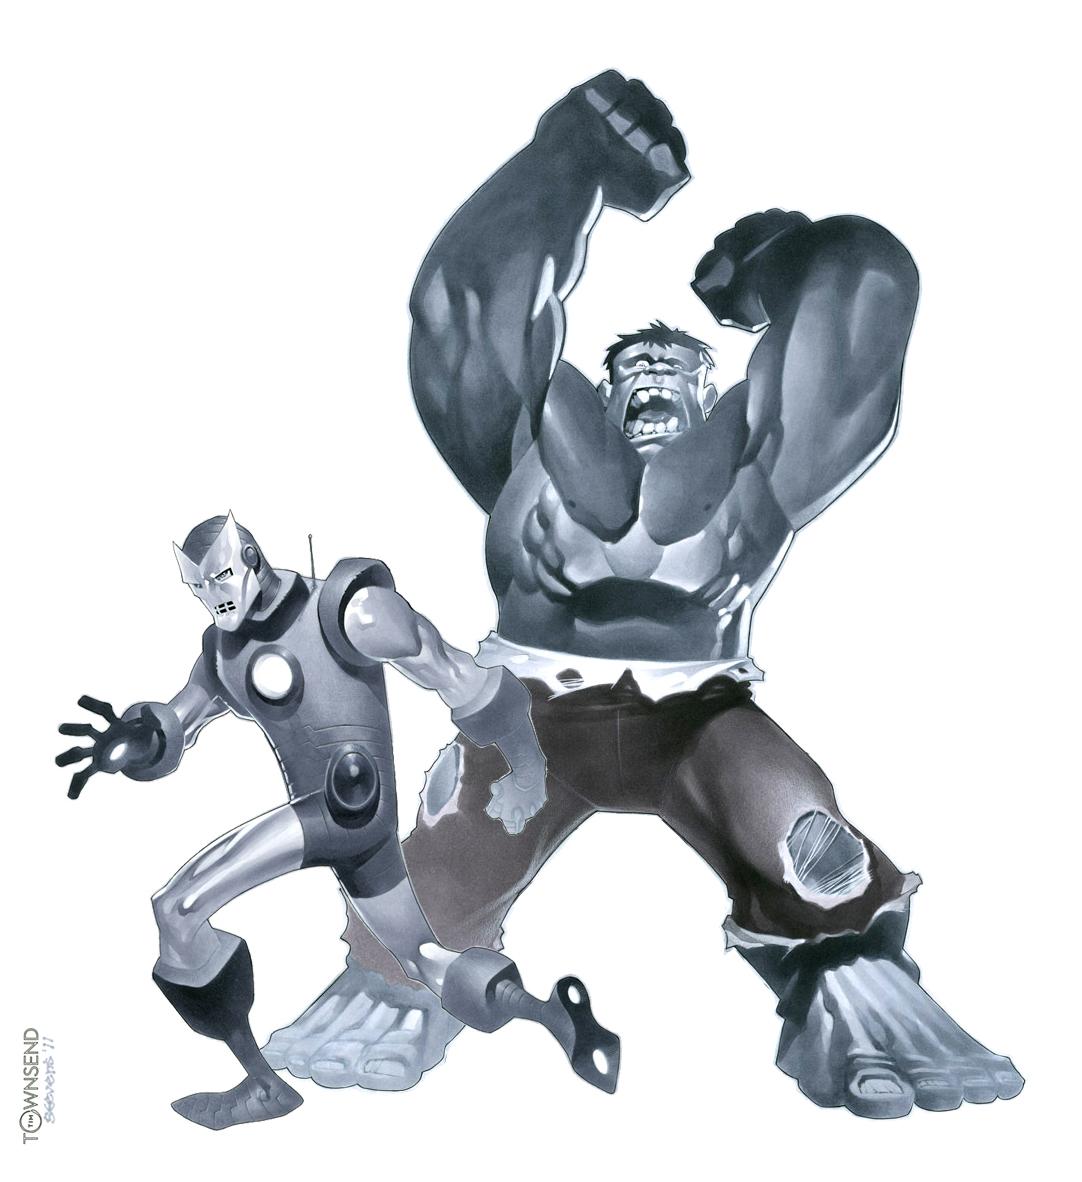 Classic Avengers sneak peak 1